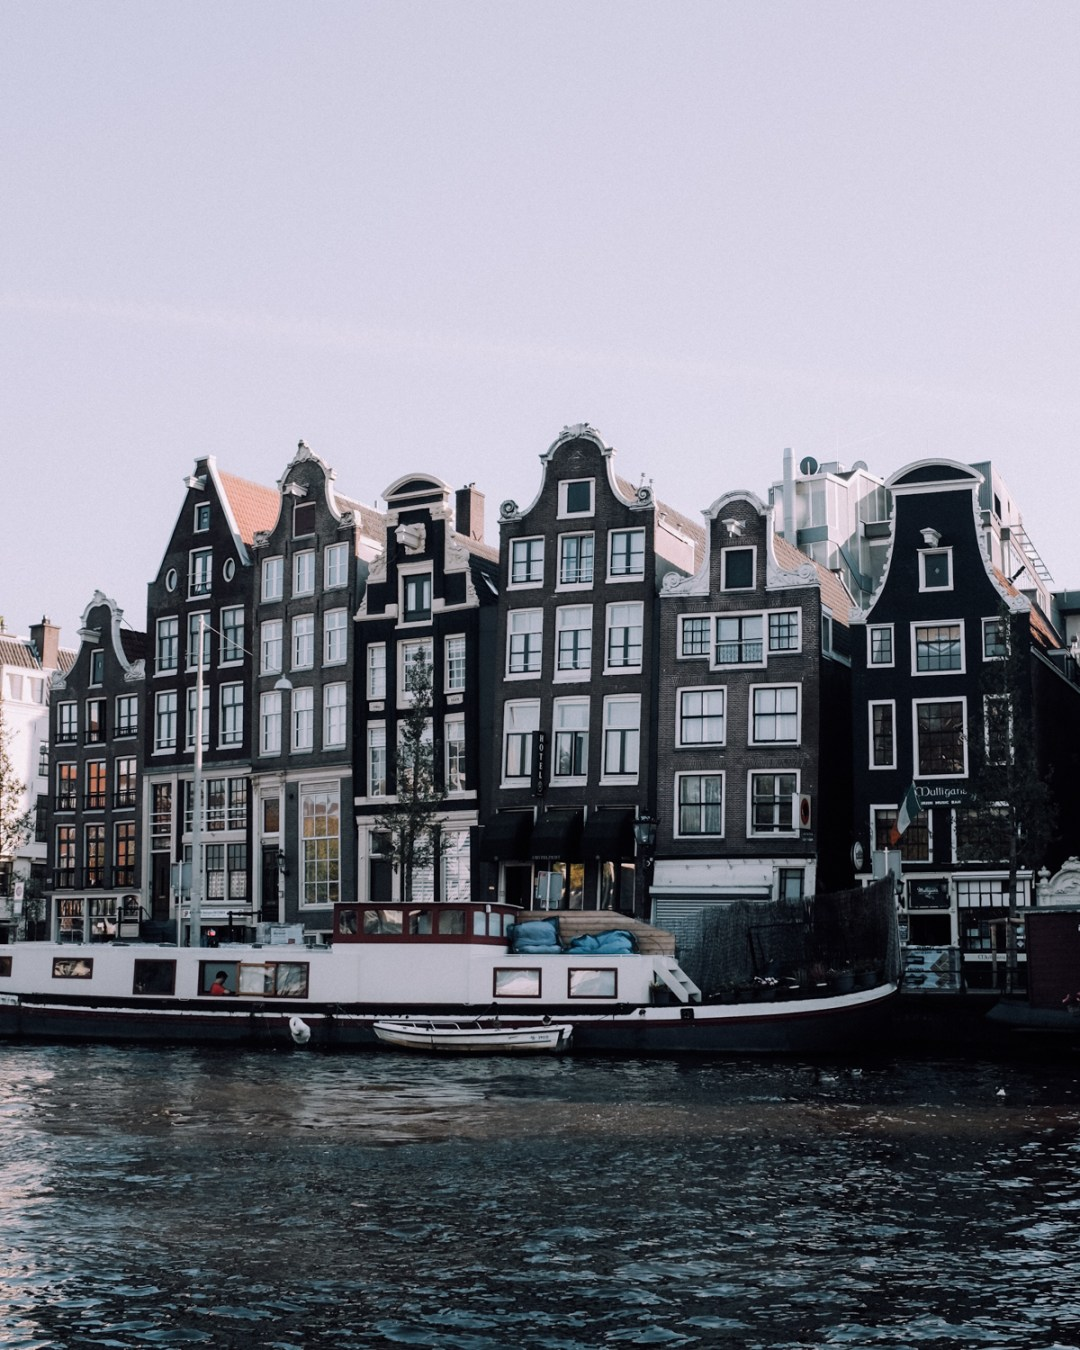 inastil, Ü50Blog, Amsterdam, Citytrip, Reiseblogger, Amsterdamtipps, Städtereise, Ü50Reiseblogger, Herbst in Amstrdam-22